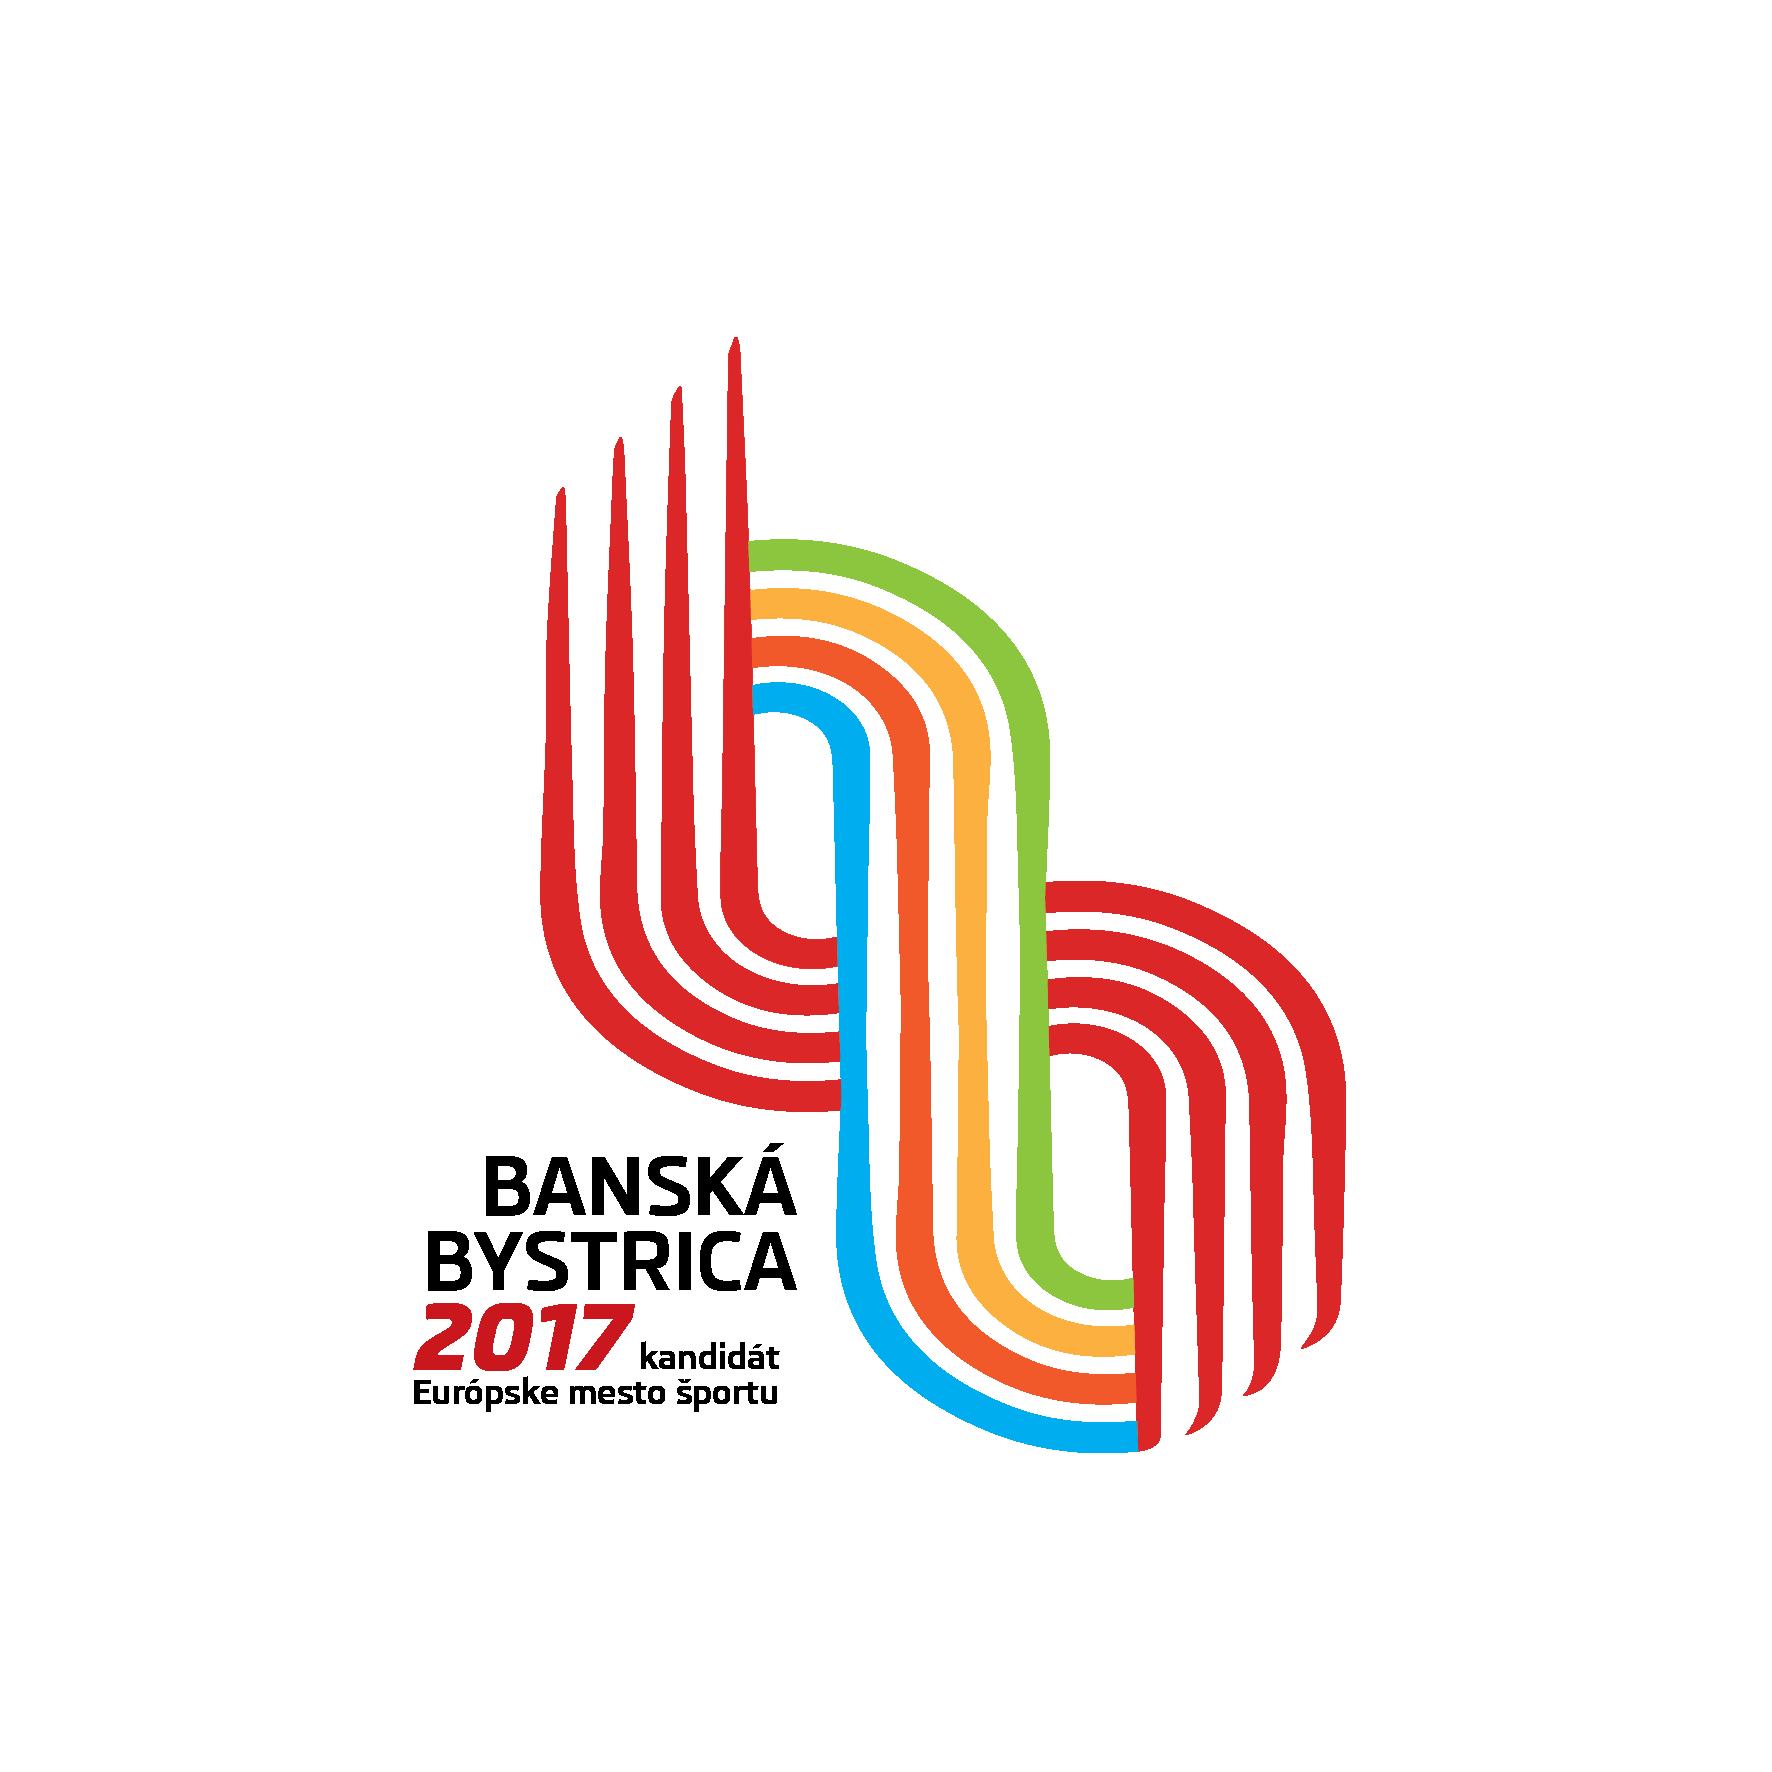 logo_b_bystrica_kandidat_mesto_sportu_2017_ver.png